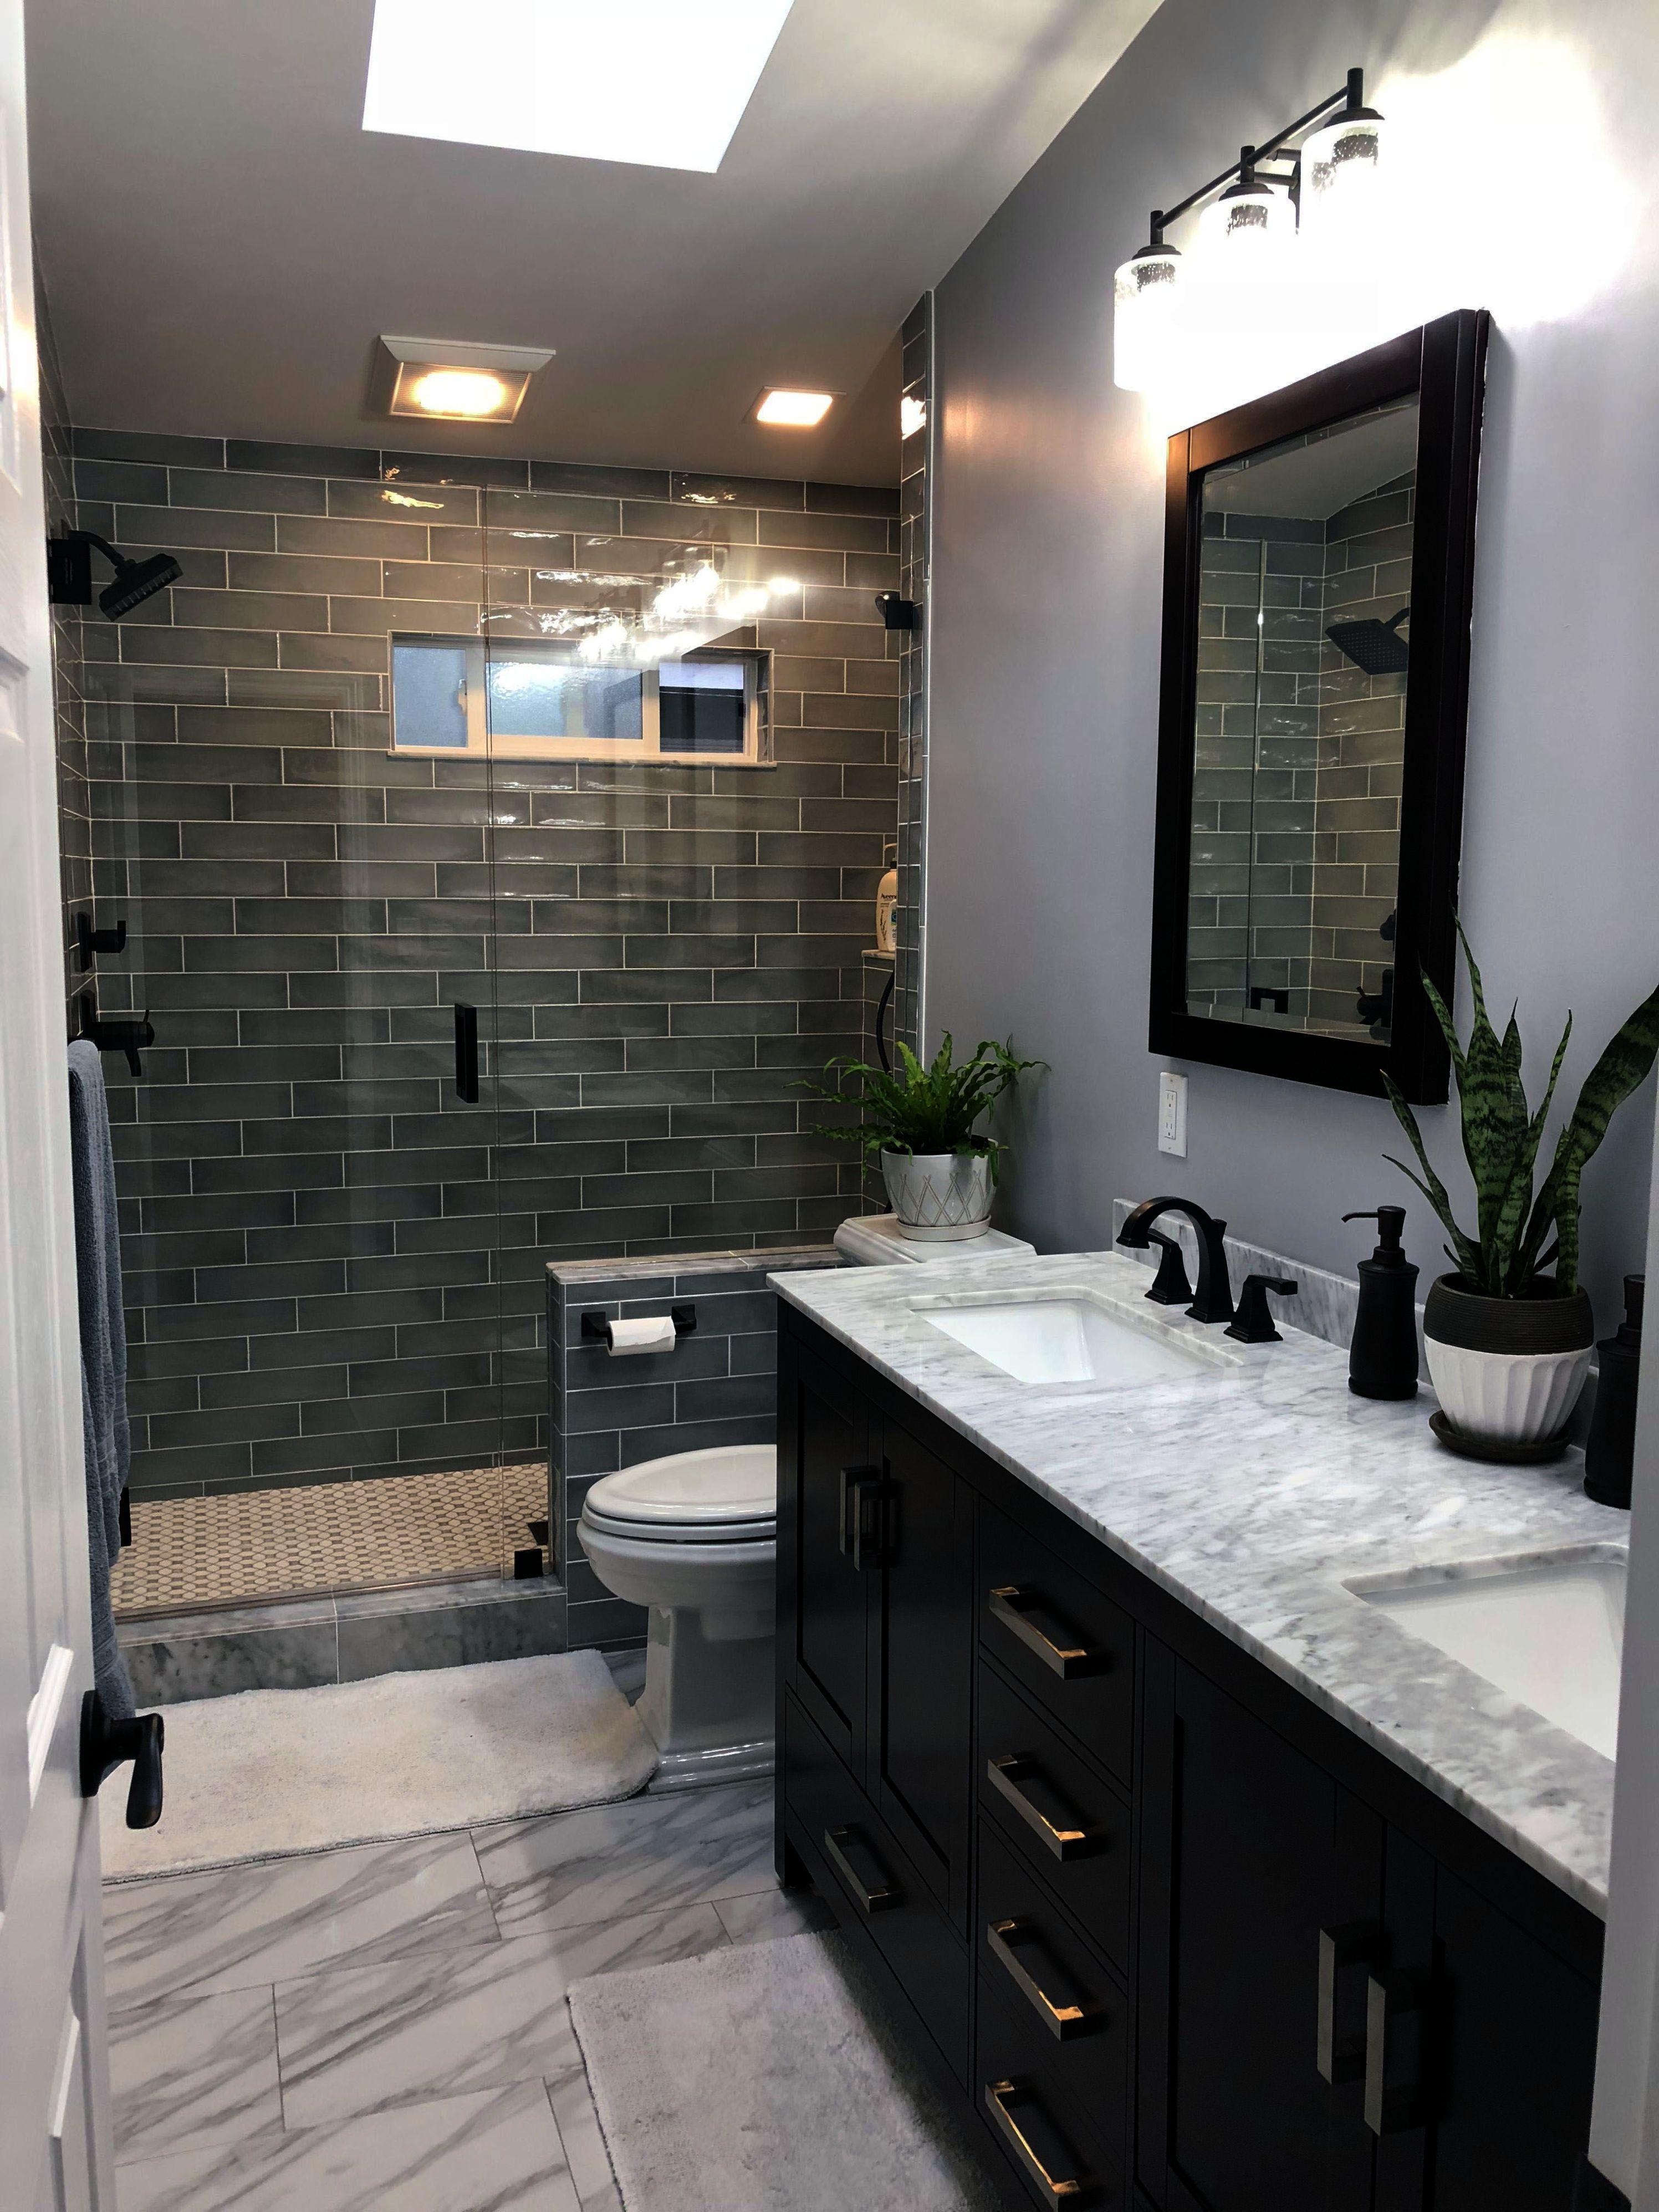 Small Bathroom Renovation Cost Perth Bathroom Ideas Simple Within Bathroom Cabinet Top Bathroom Design Bathroom Renovation Cost Small Bathroom Renovation Cost